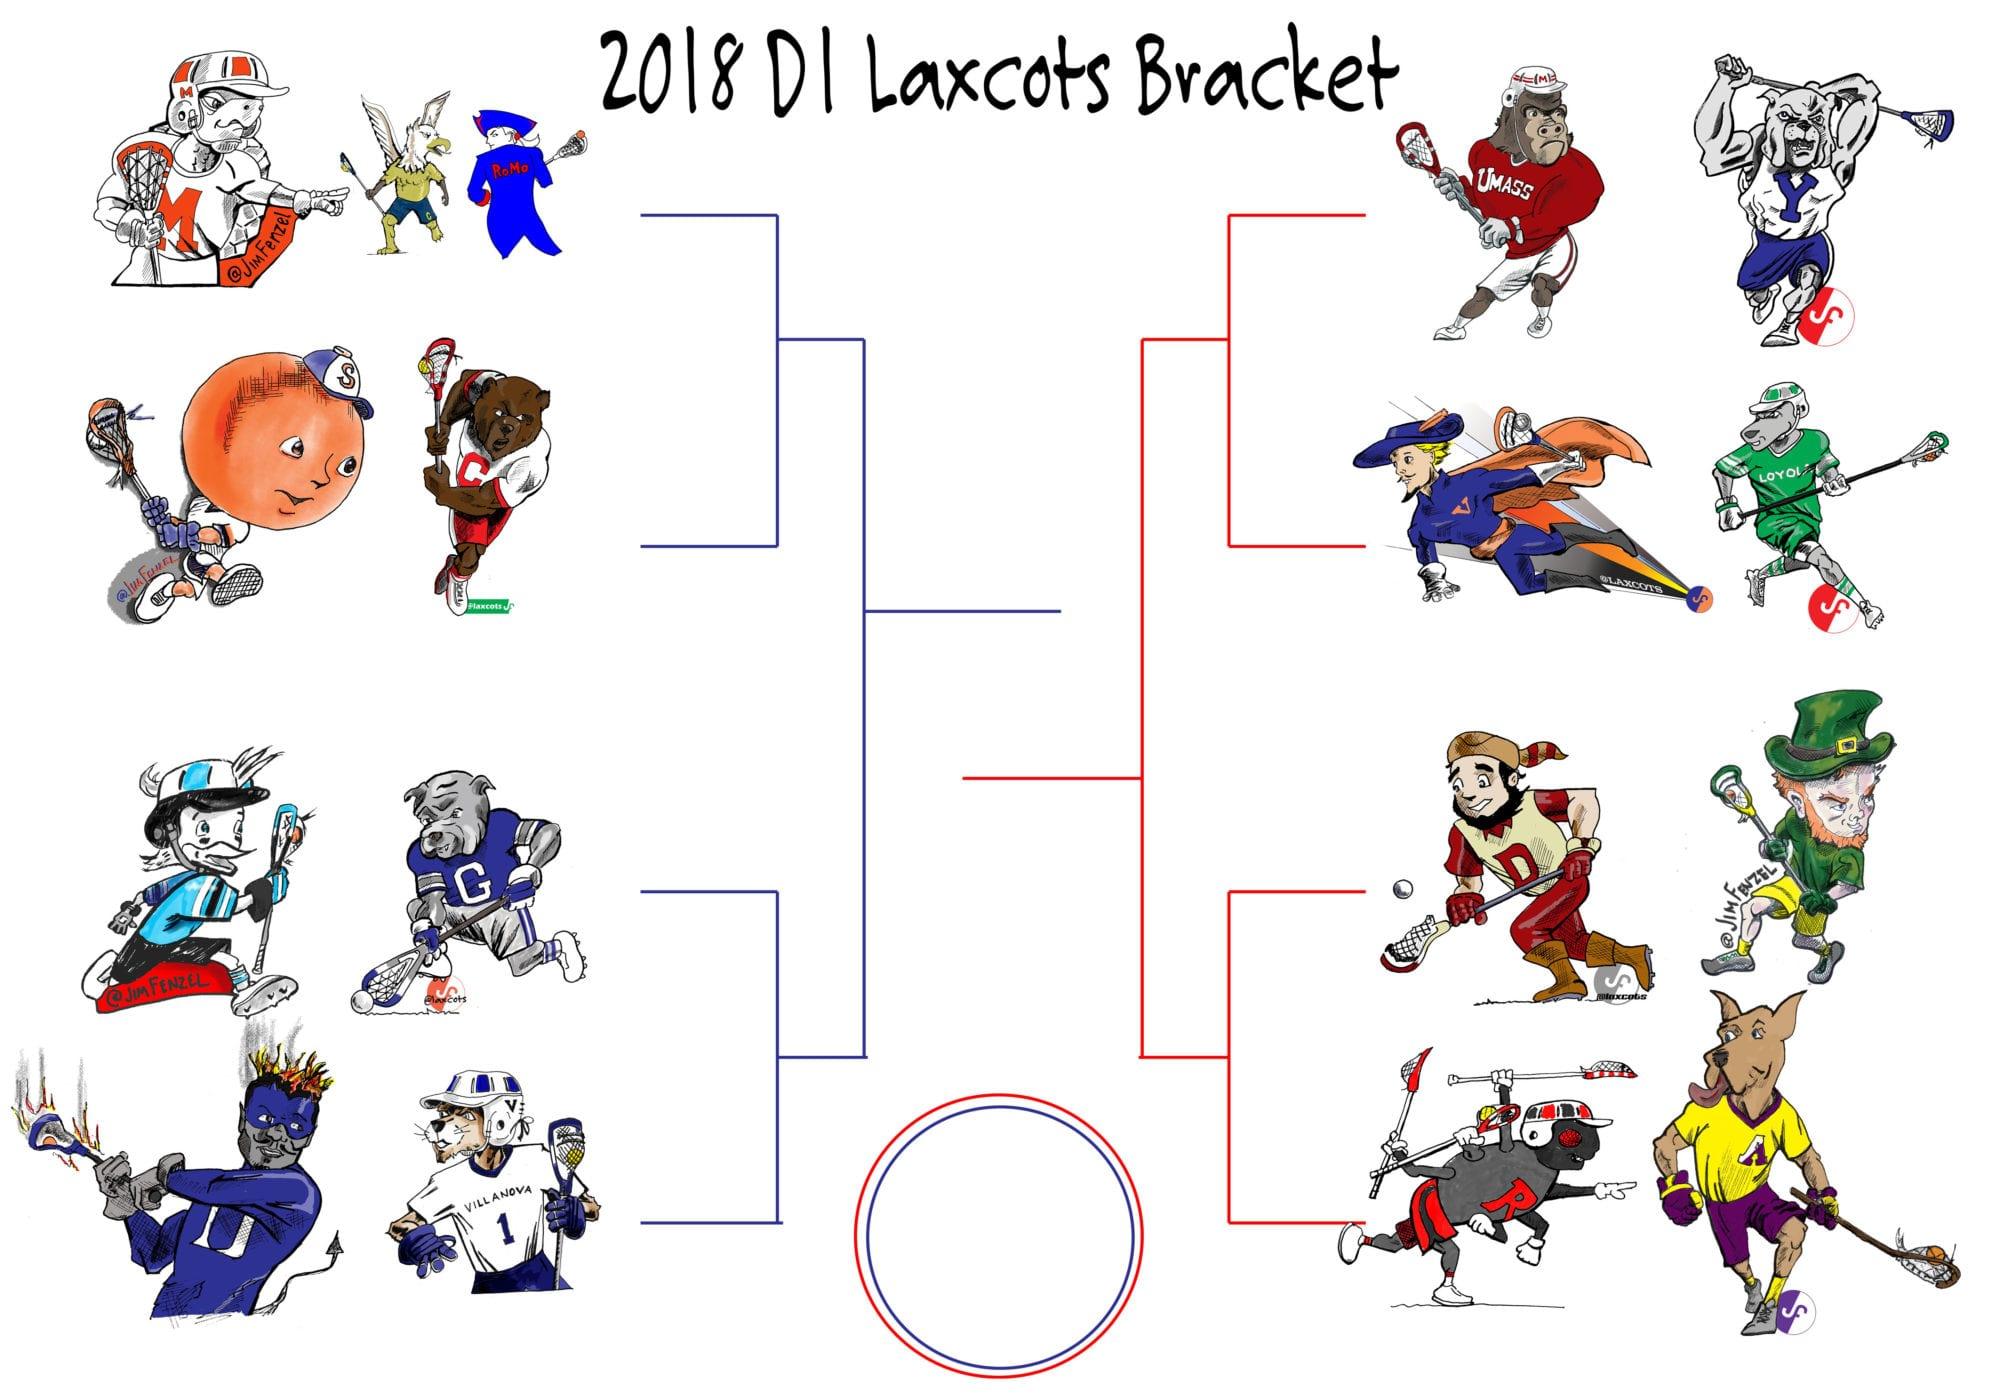 Laxcot 2018 bracket NCAA Tournament